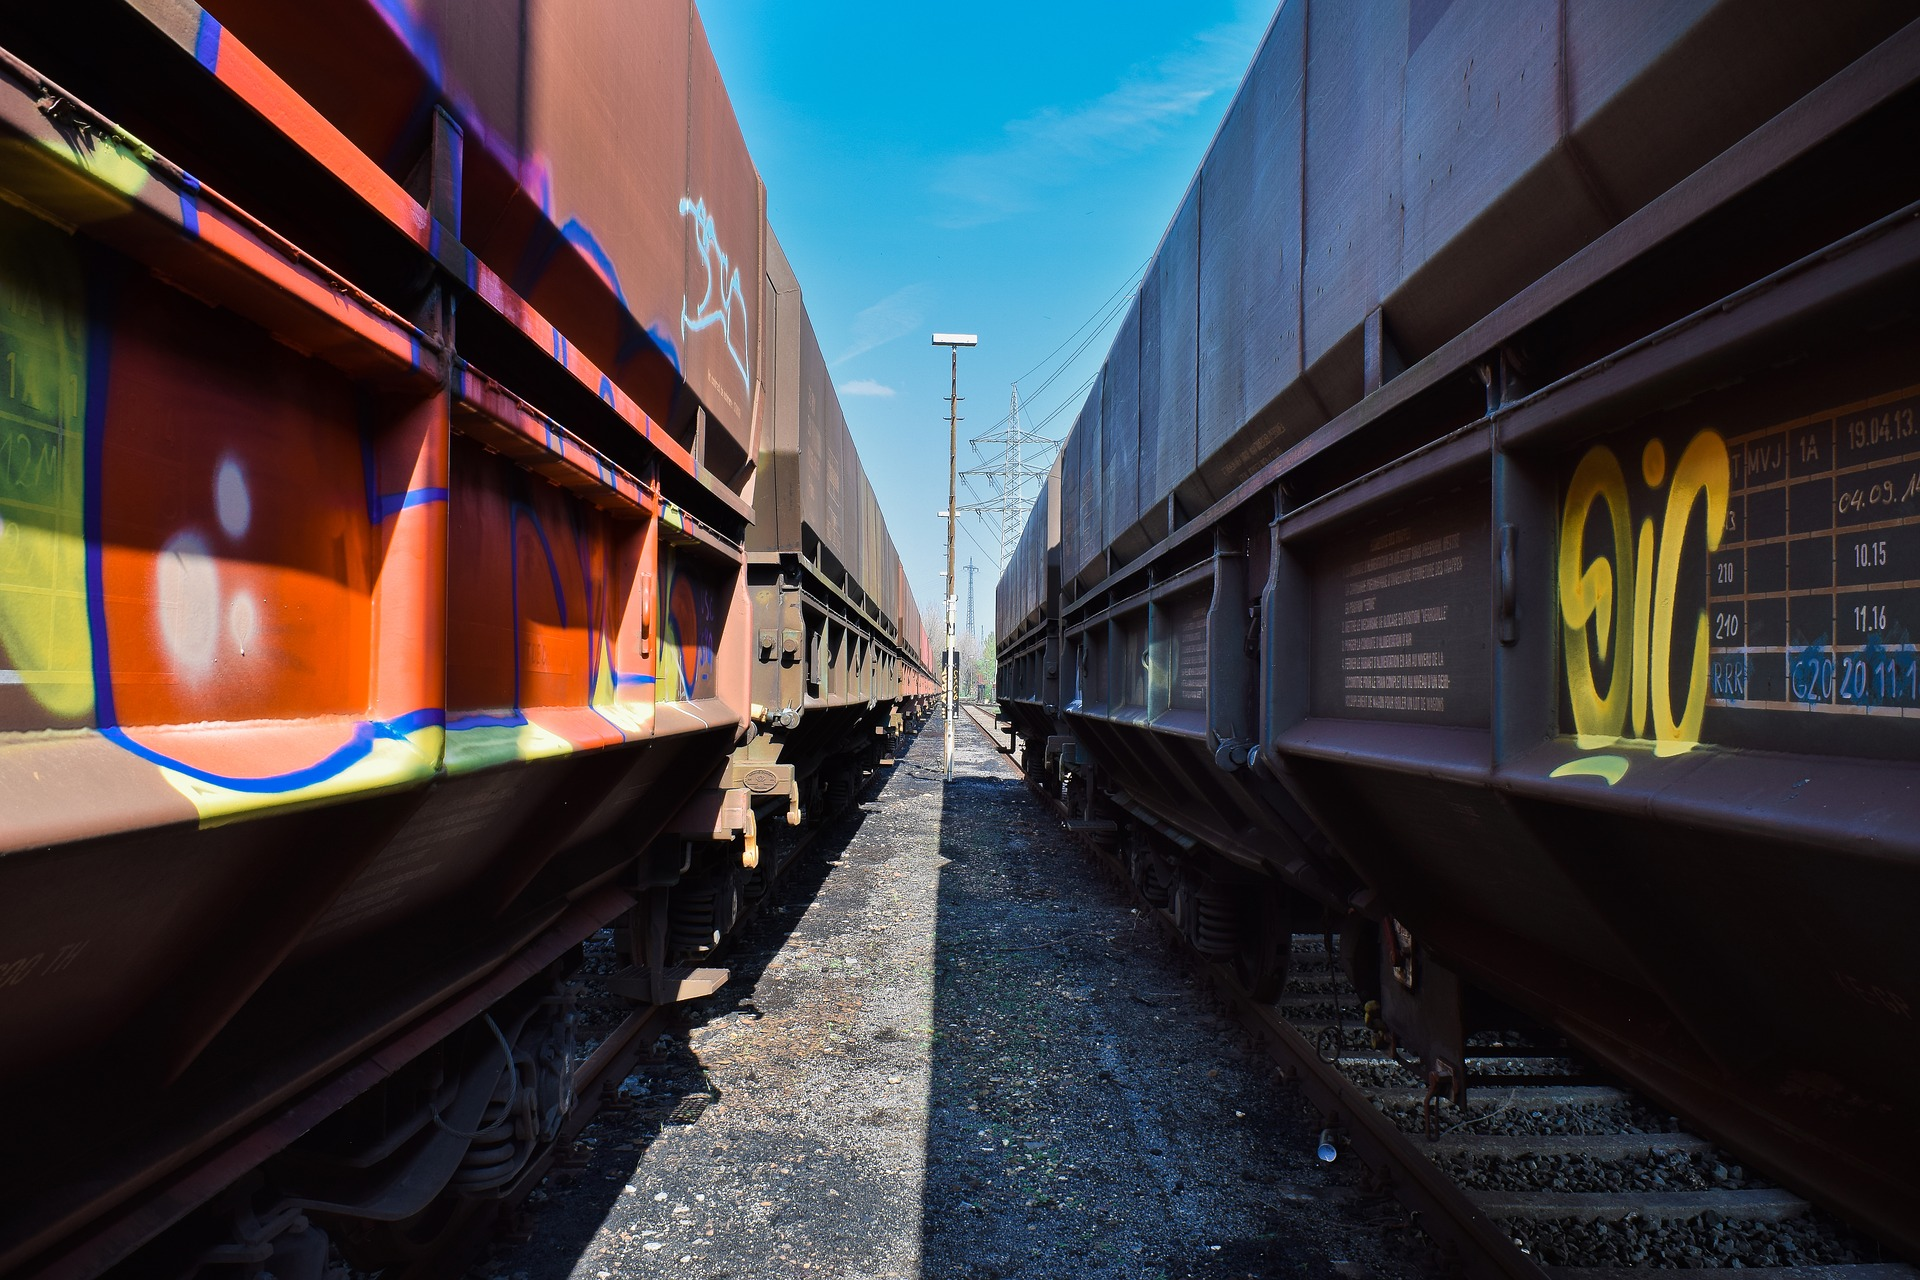 railway-4129213_1920-Image by Michael Gaida from Pixabay